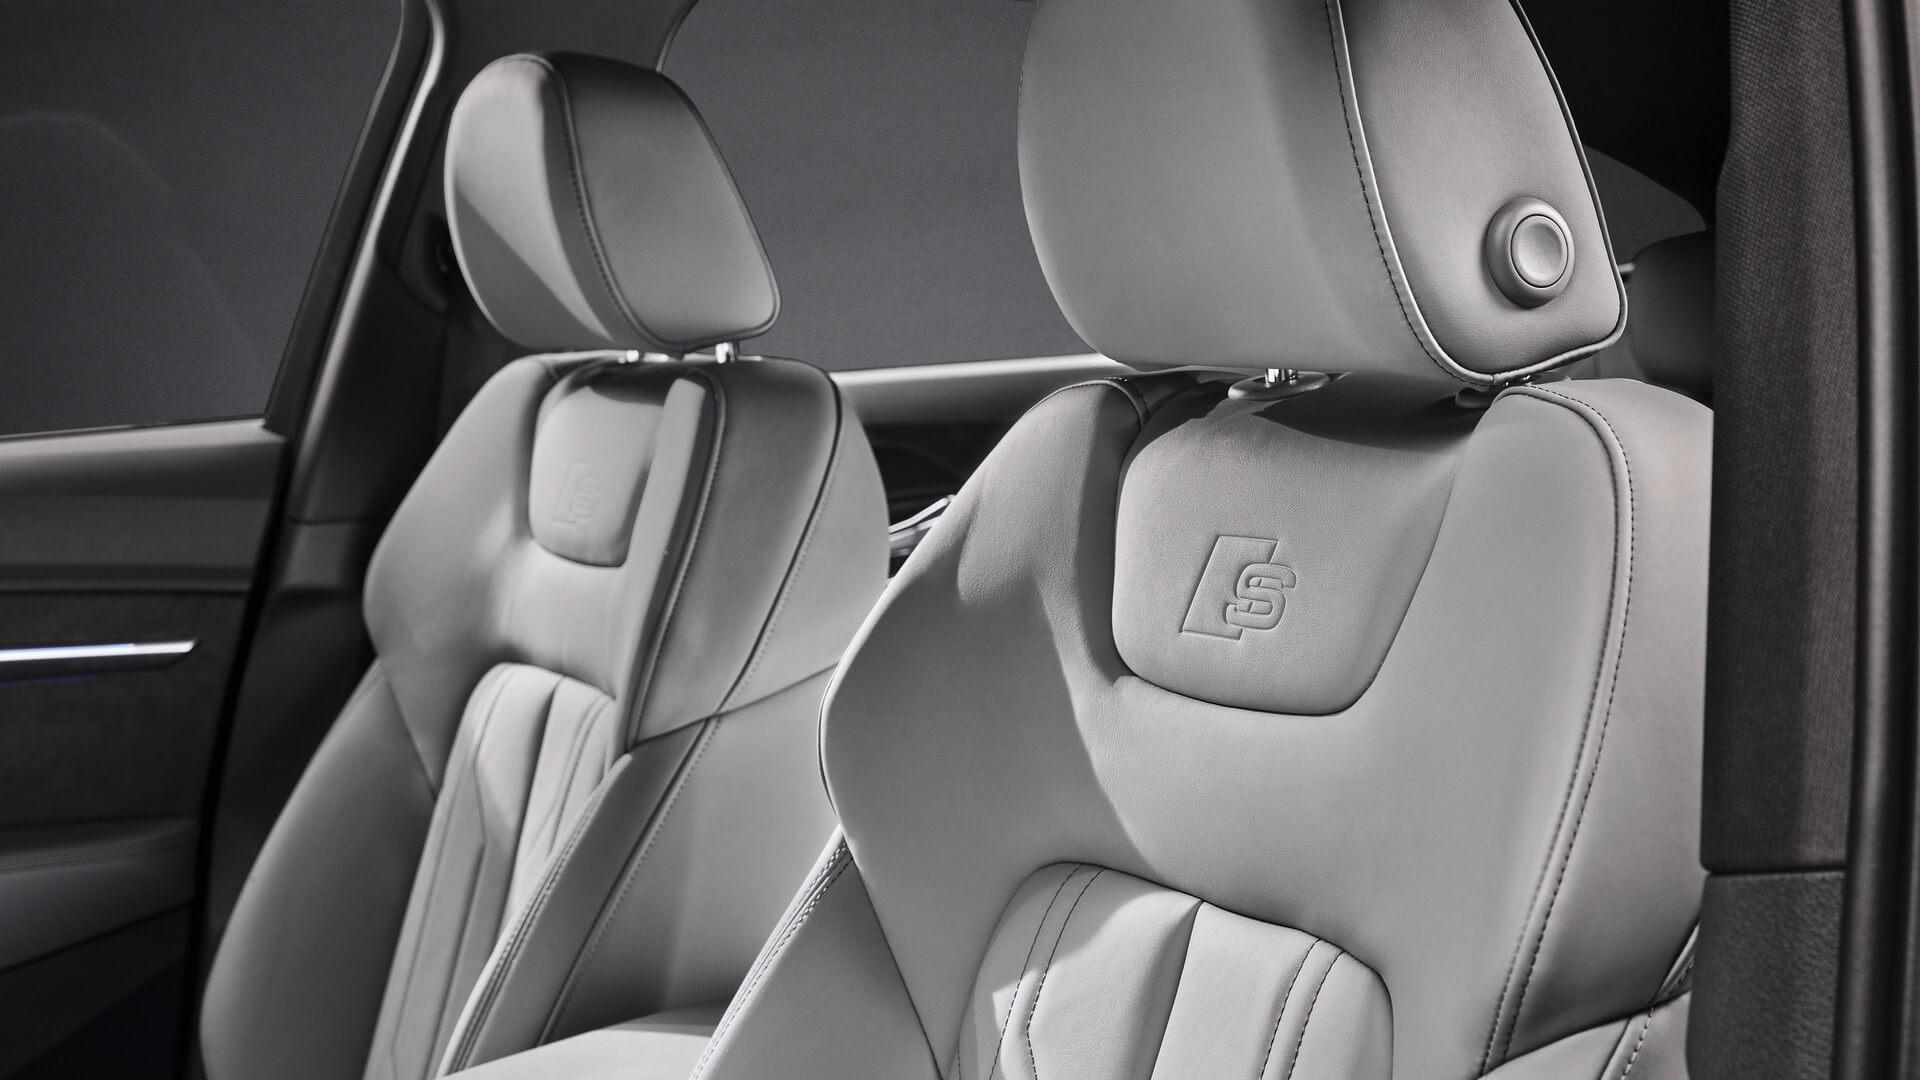 Audi-E-Tron-S-and-E-Tron-S-Sportback-2020-121